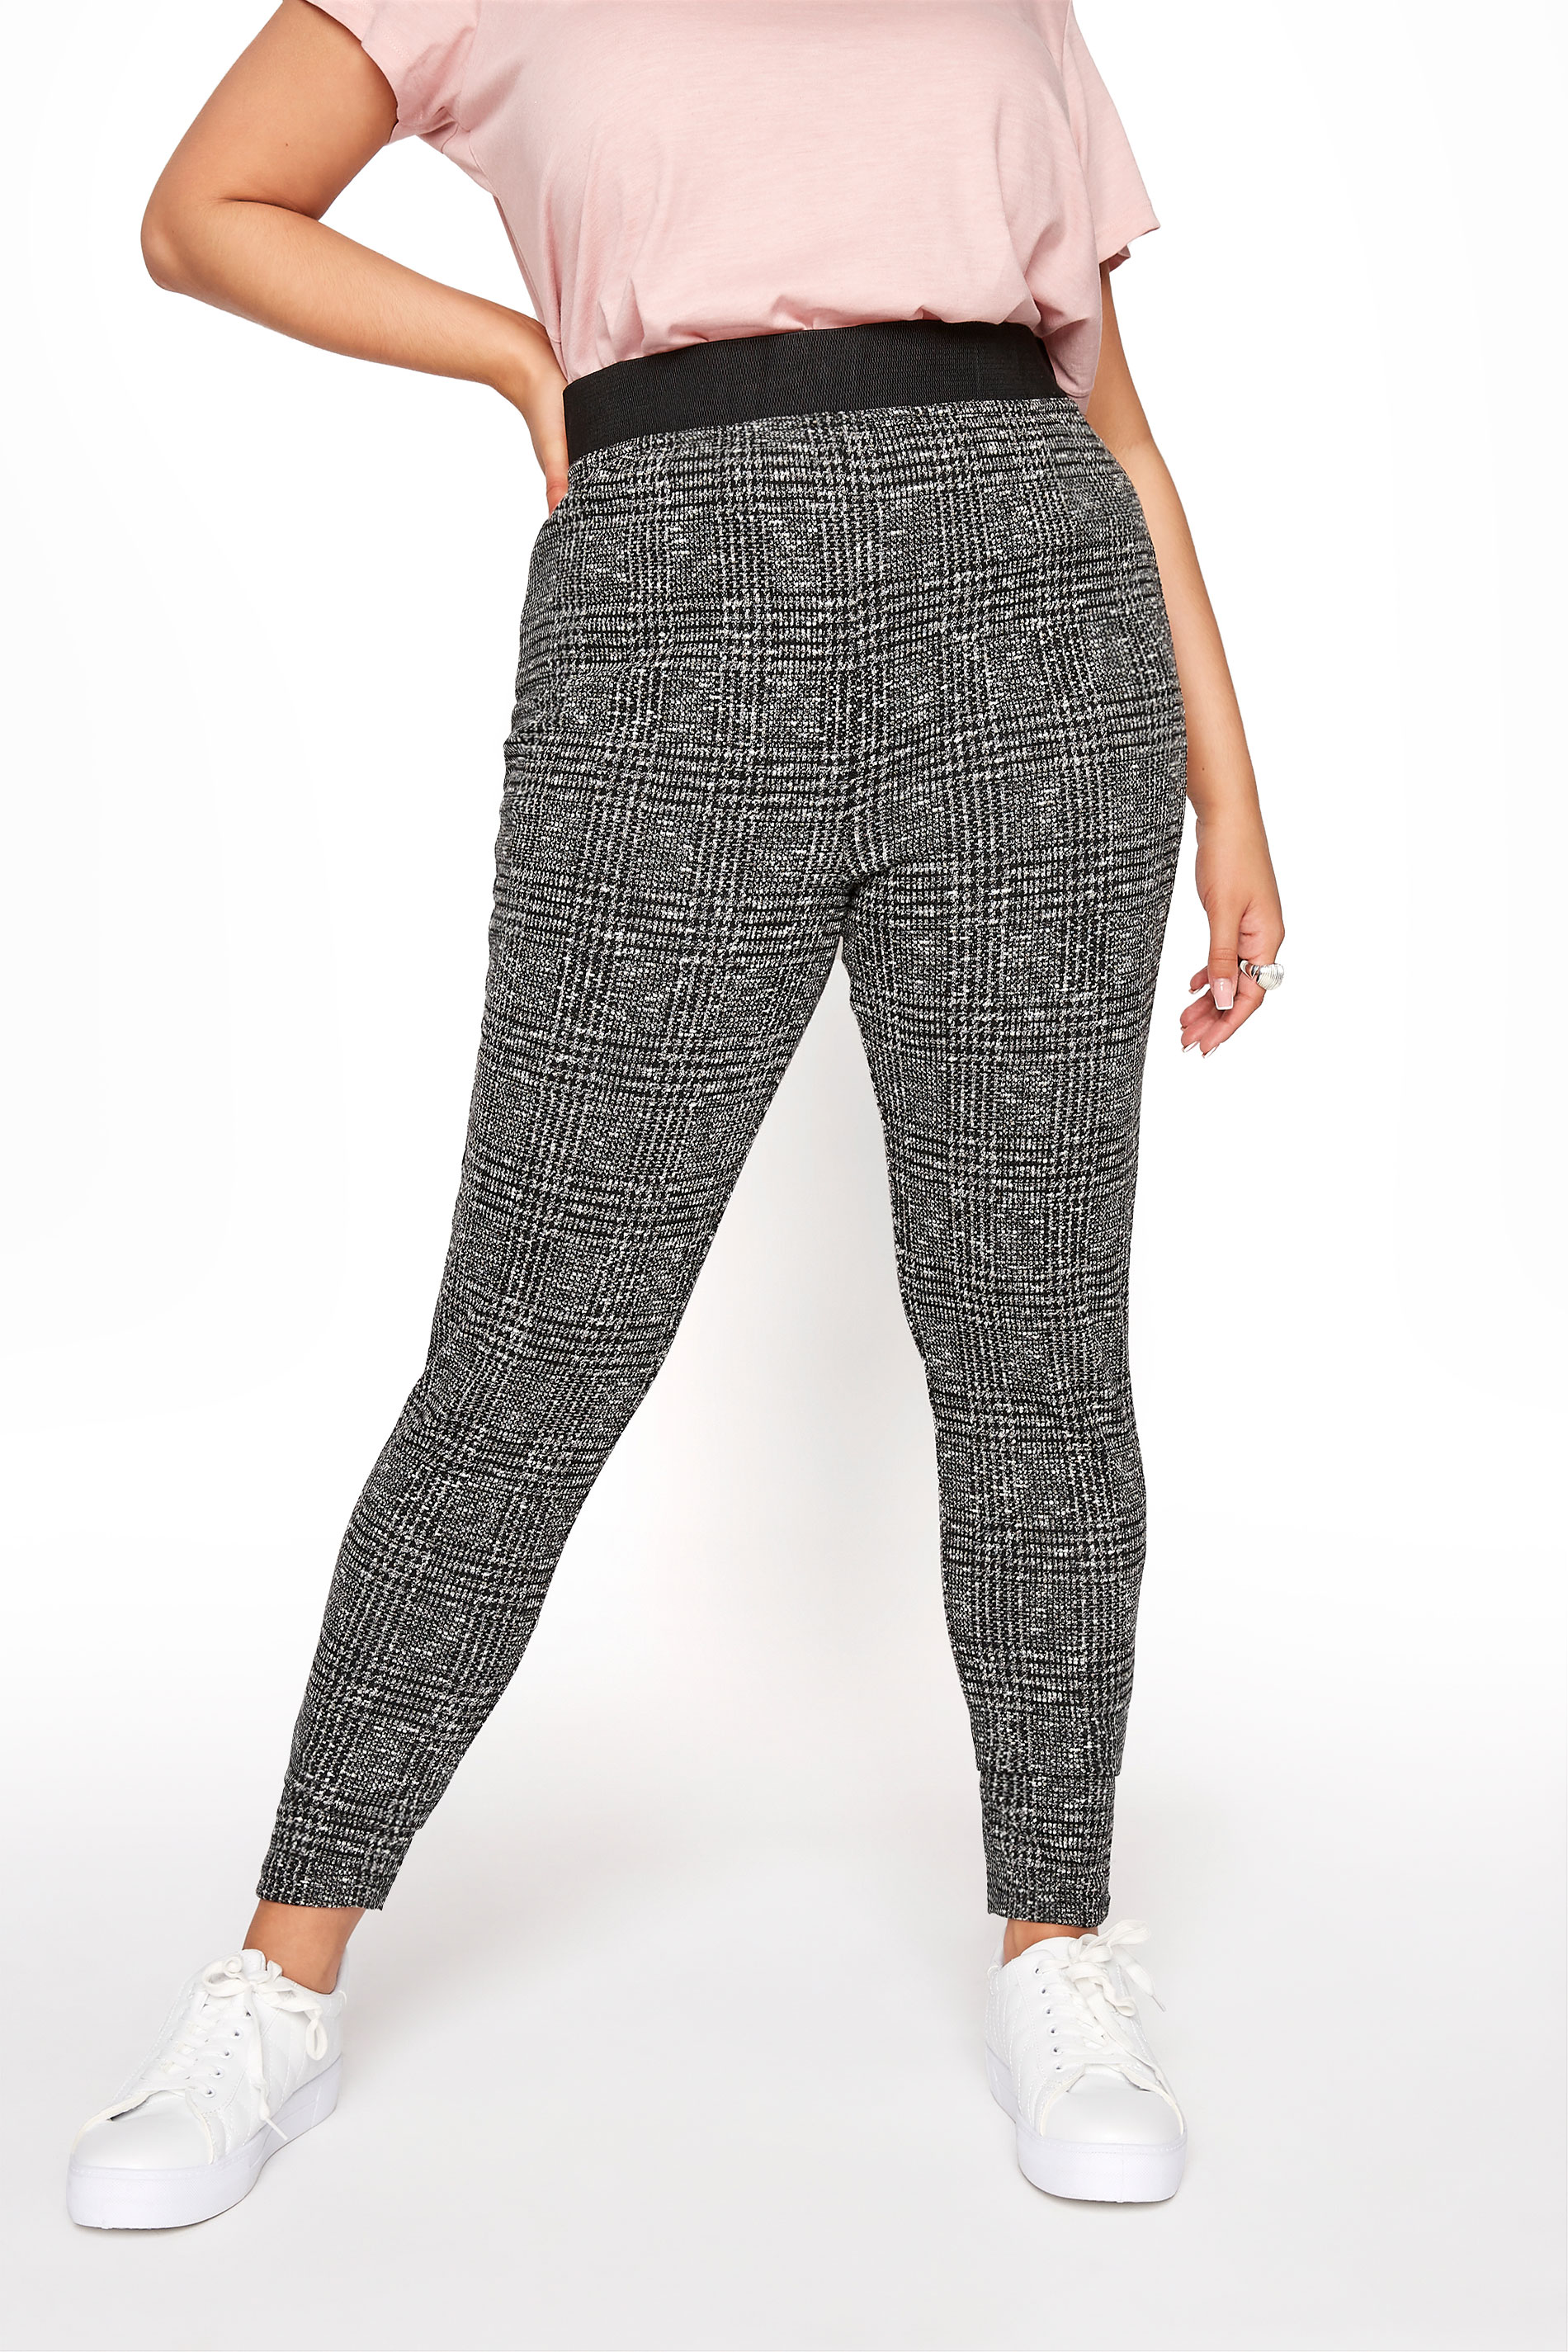 Grey Boucle Check Slim Fit Trousers_B.jpg